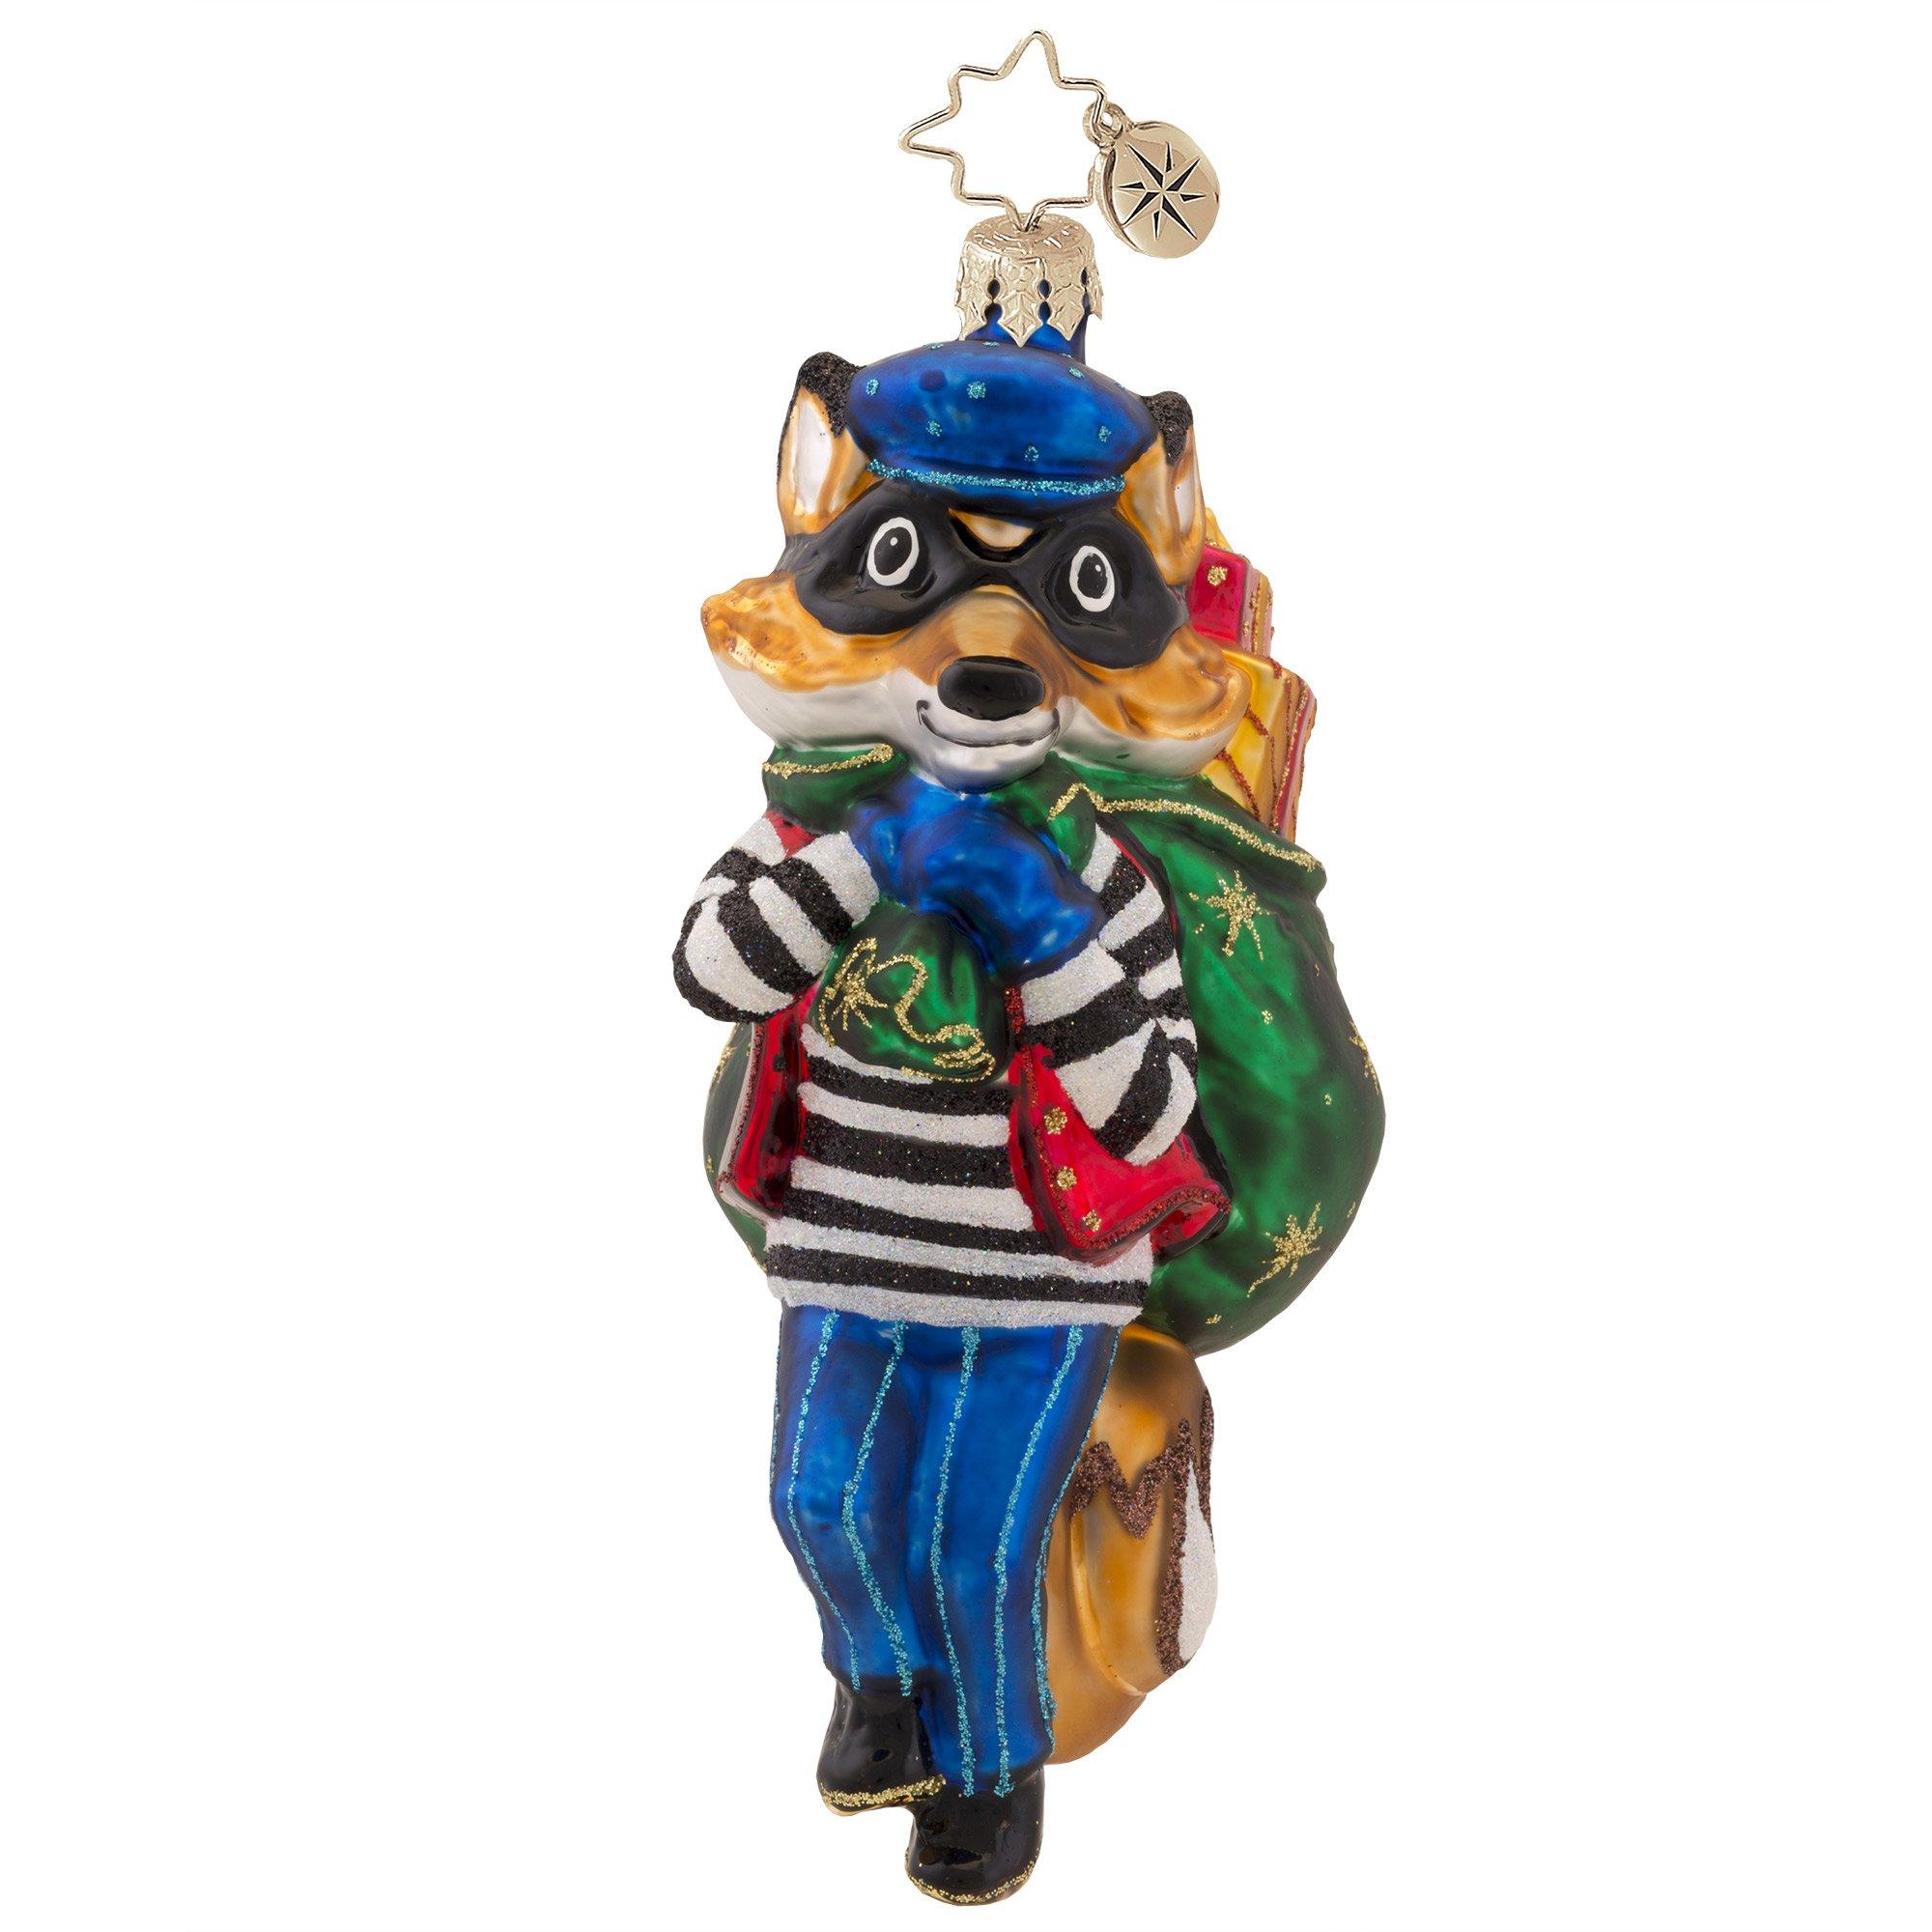 Christopher Radko Foxy Bandit Christmas Ornament